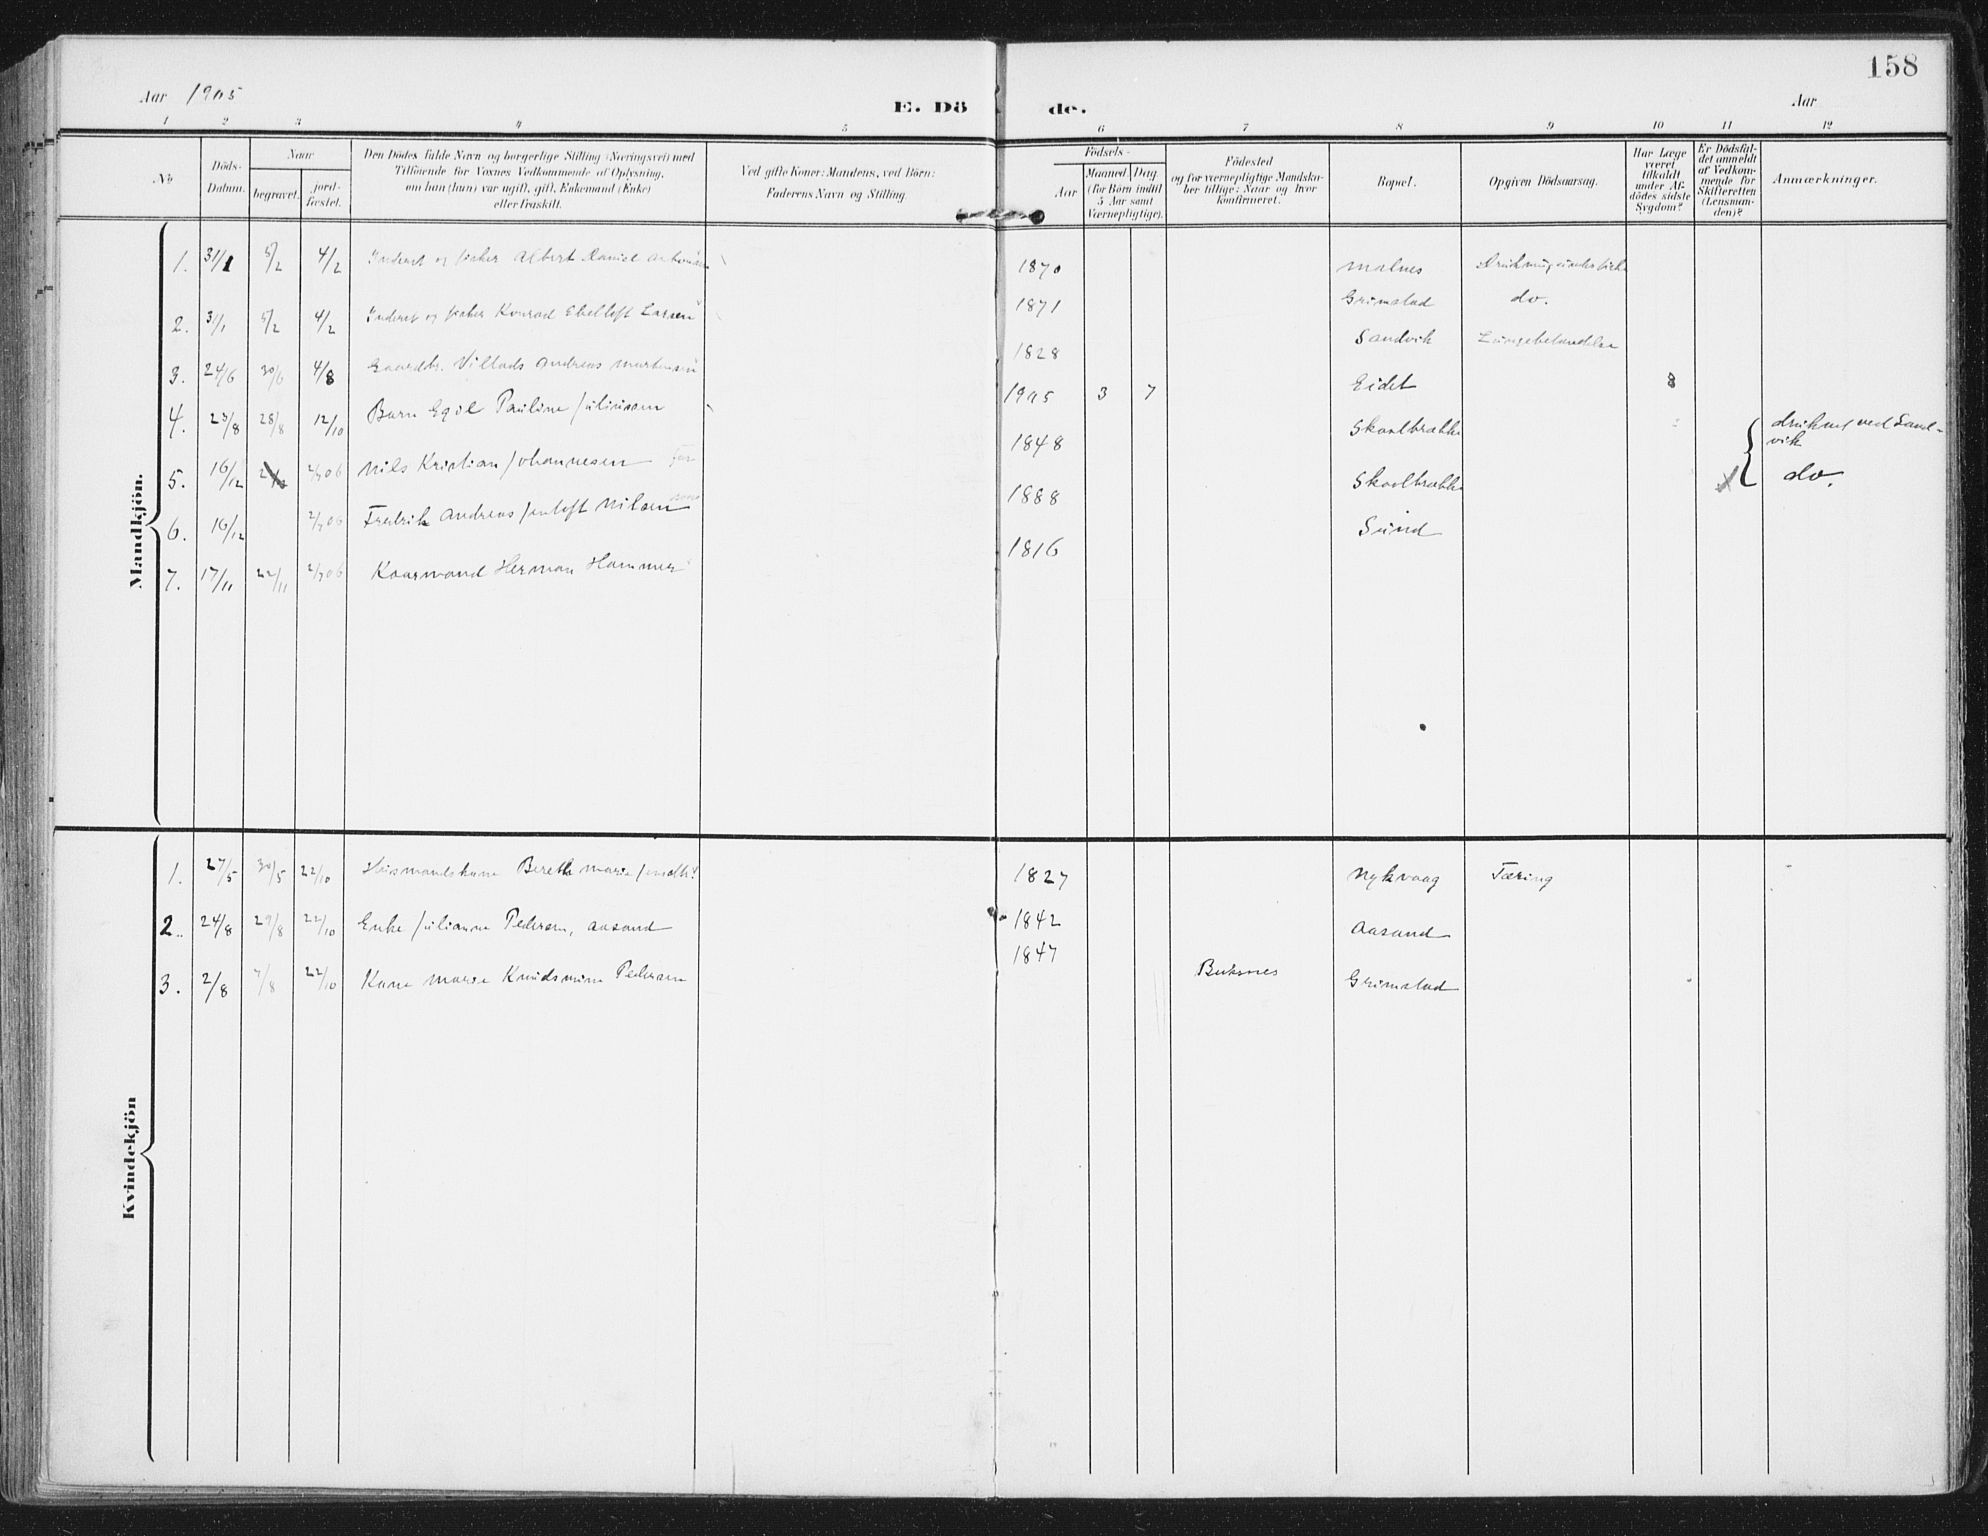 SAT, Ministerialprotokoller, klokkerbøker og fødselsregistre - Nordland, 892/L1321: Ministerialbok nr. 892A02, 1902-1918, s. 158